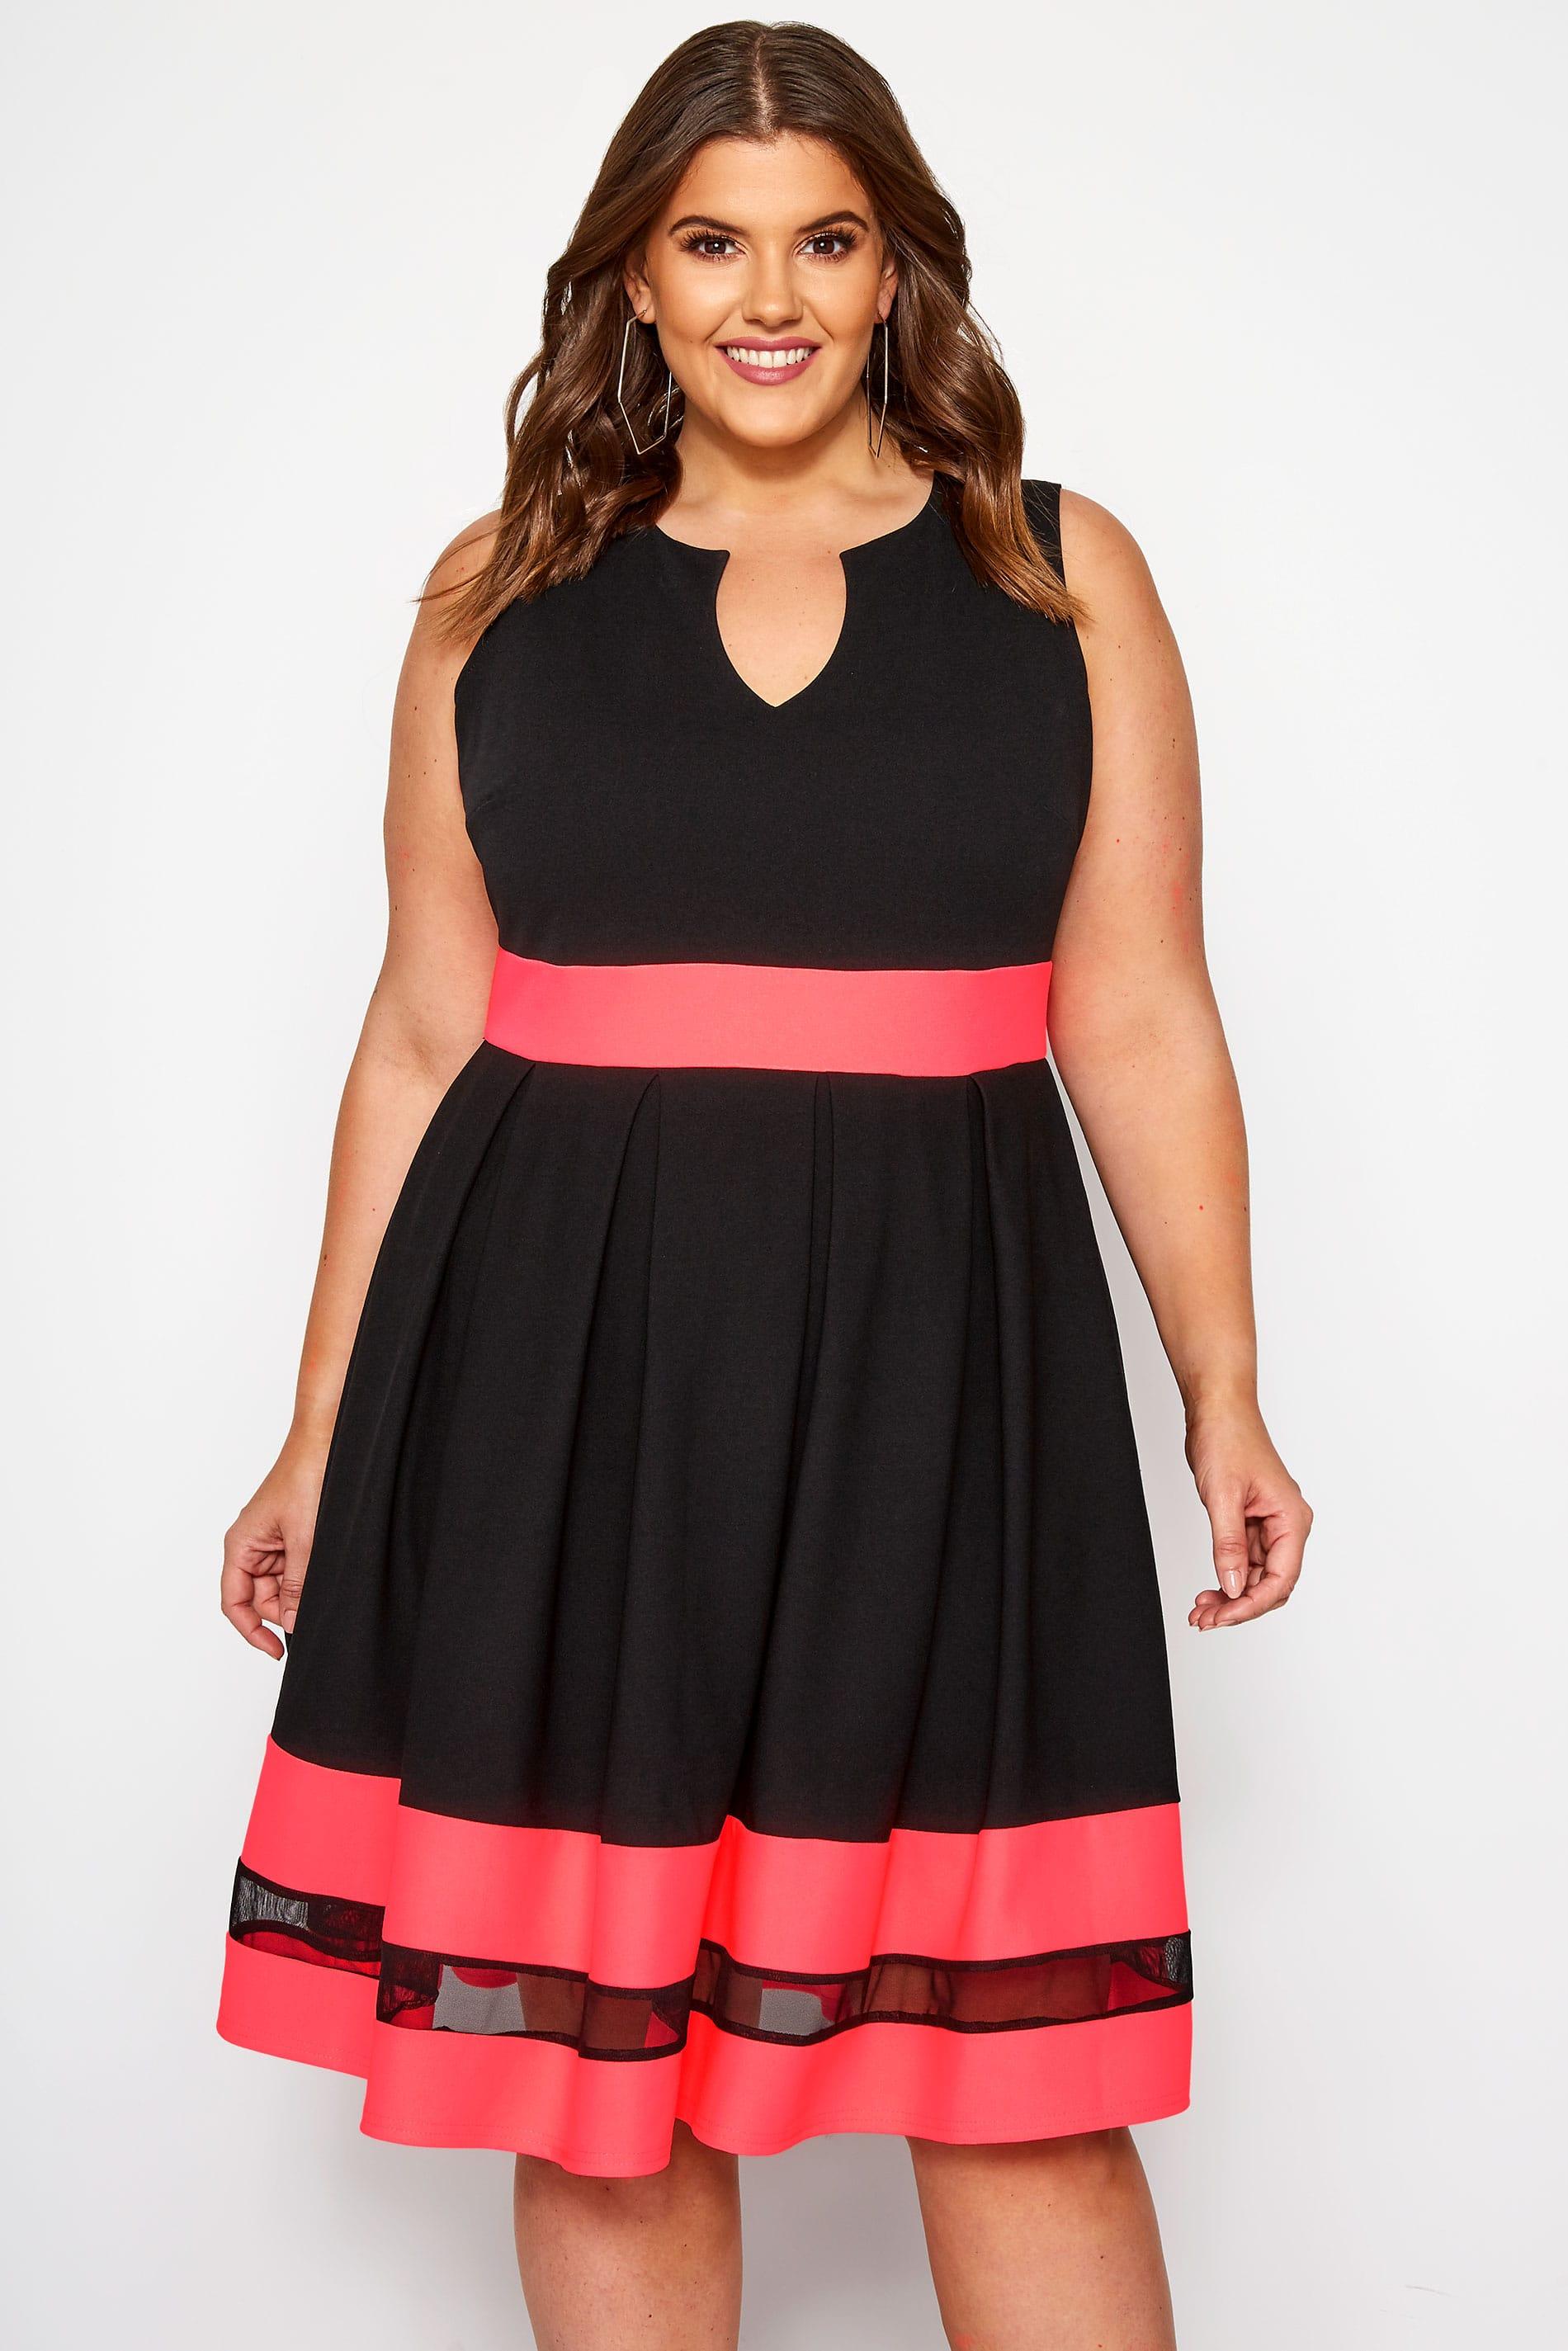 Black & Pink Scuba Skater Dress